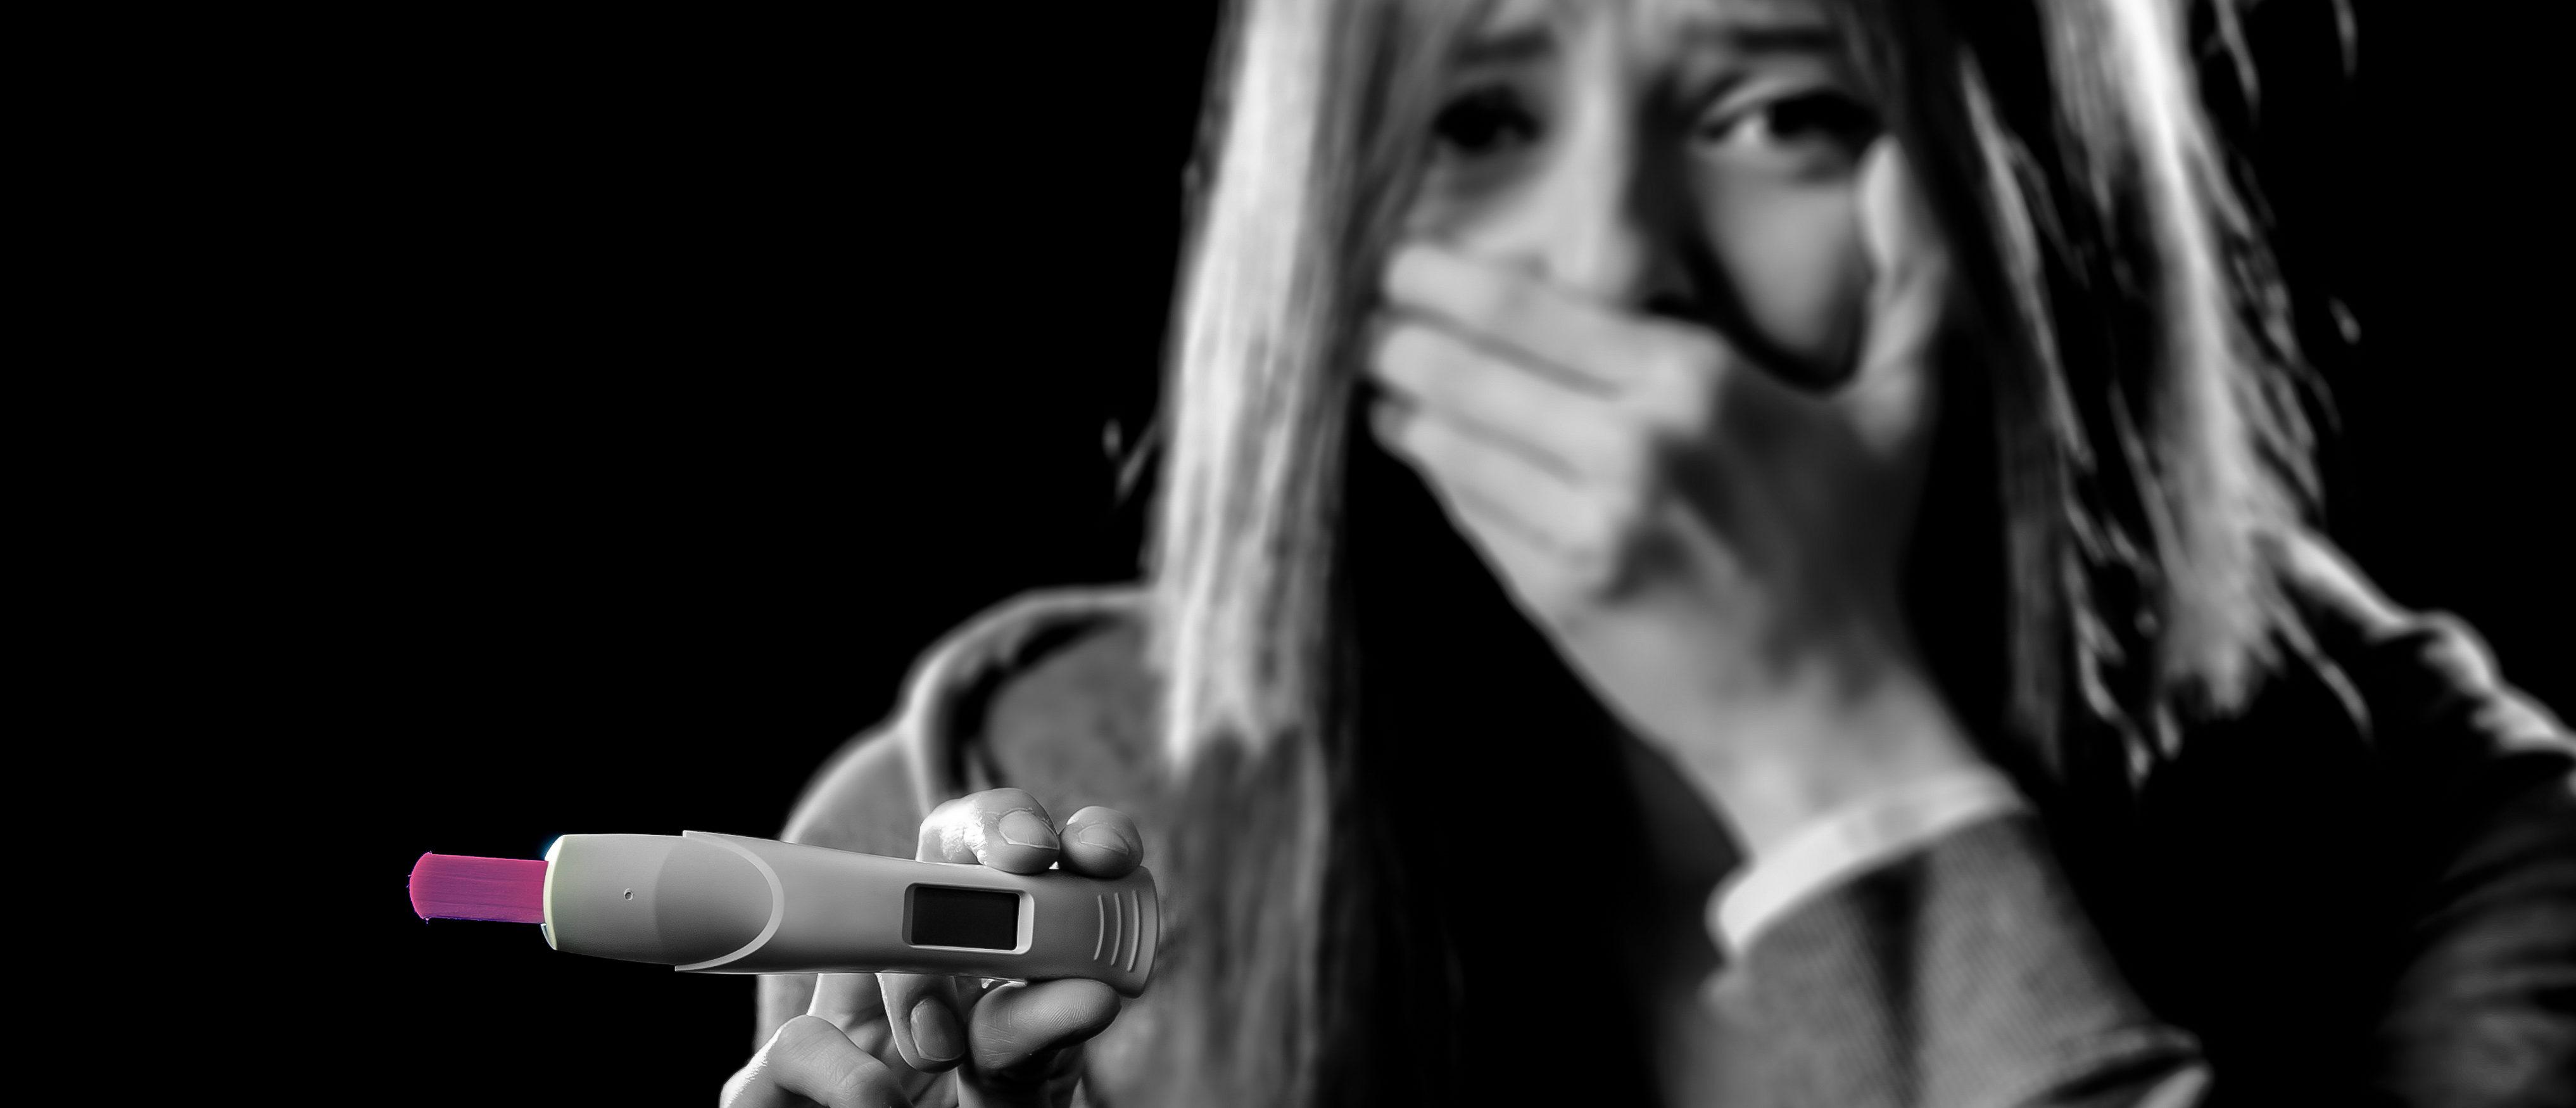 teen pregnancy test Shutterstock/Marcos Mesa Sam Wordley